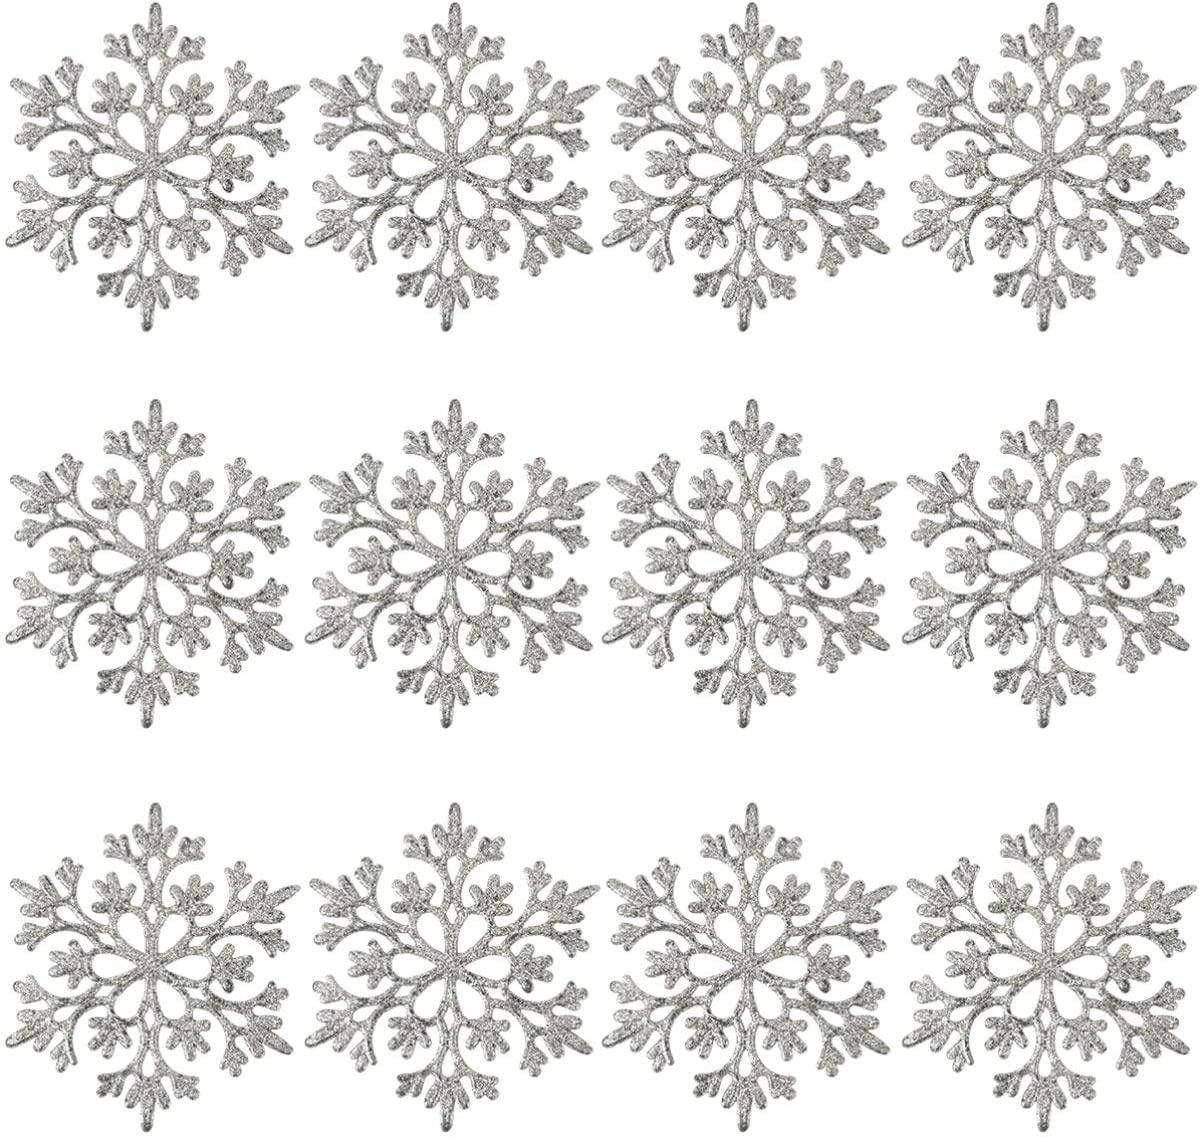 BESTOYARD 12pcs Christmas Glitter Snowflake Ornament 10CM Plastic Snowflake Hanging Pendant Xmas Tree Decorations for Winter Holiday Party Silver